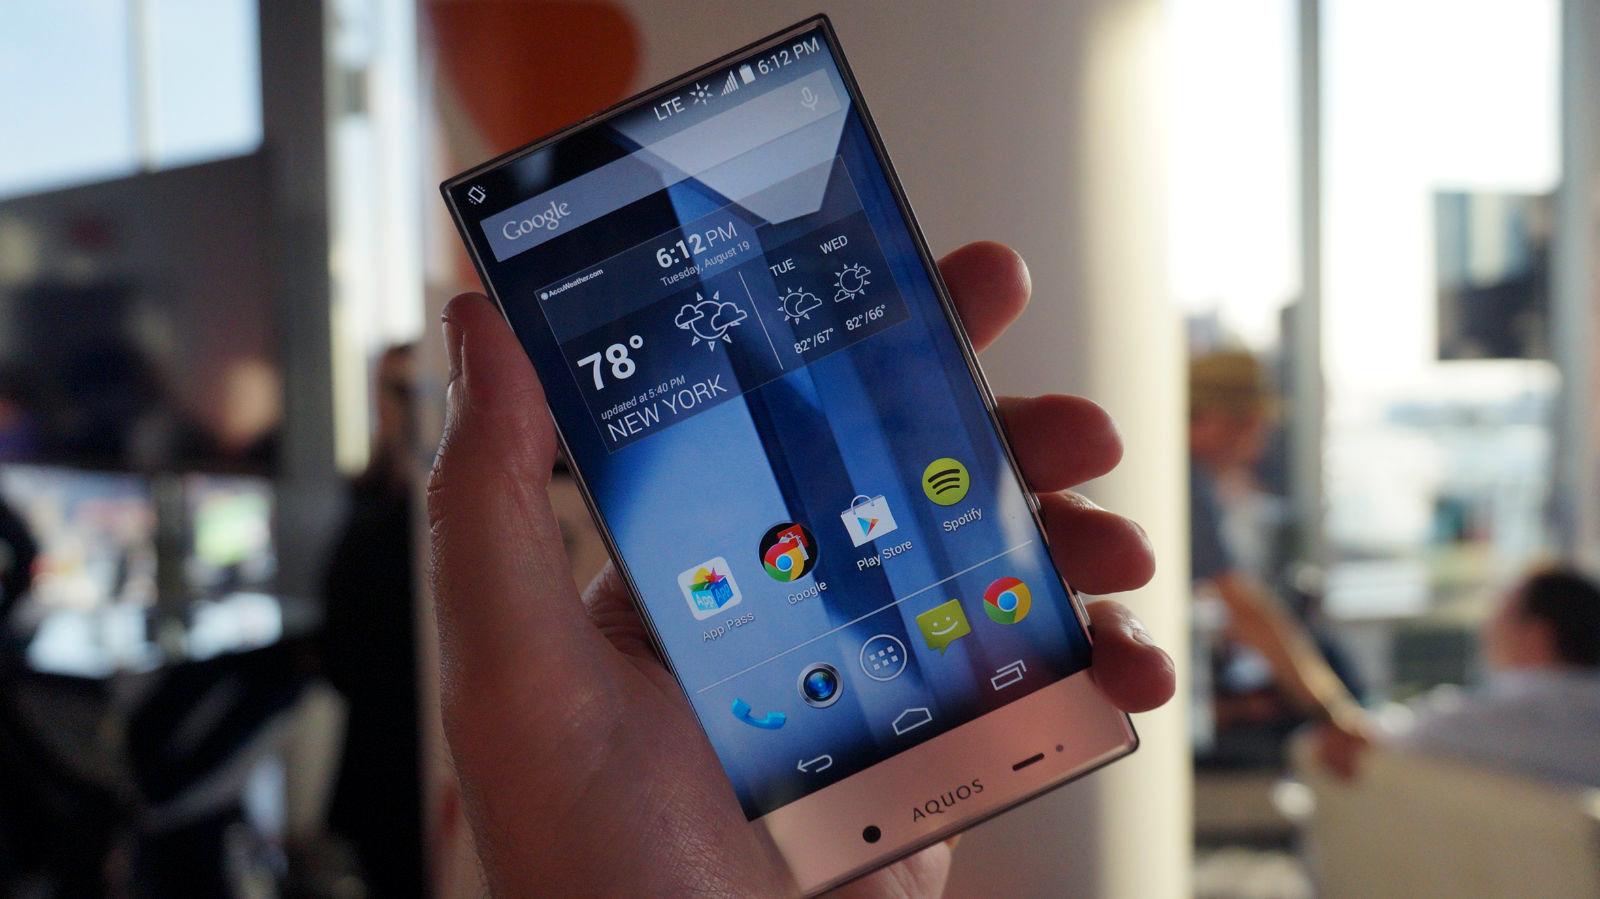 Hands on: Sharp Aquos Crystal review | TechRadar